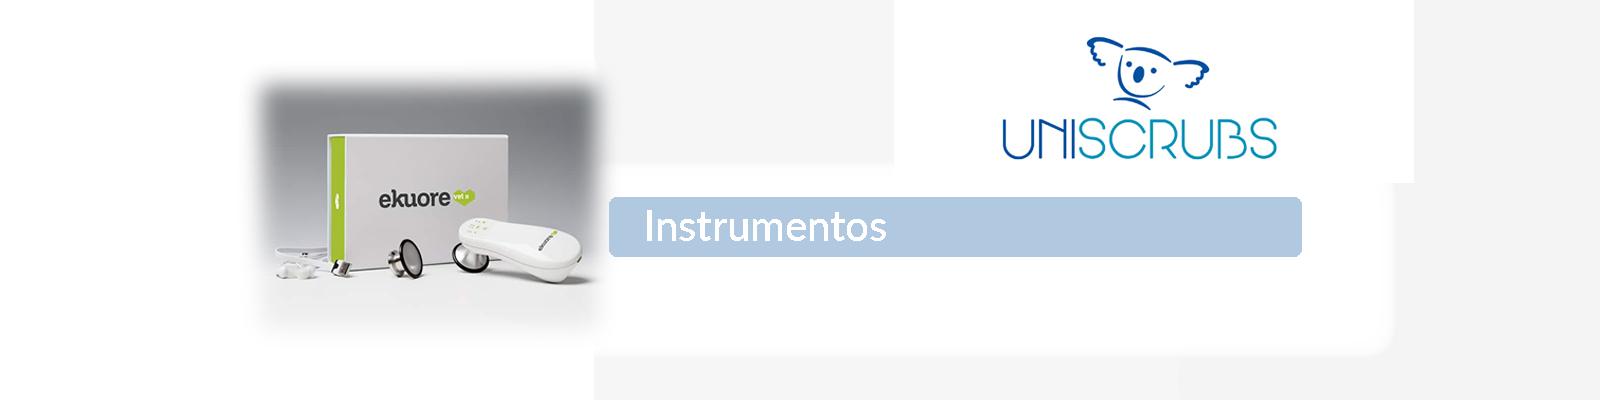 Uniscrubs portada-Instrumentos